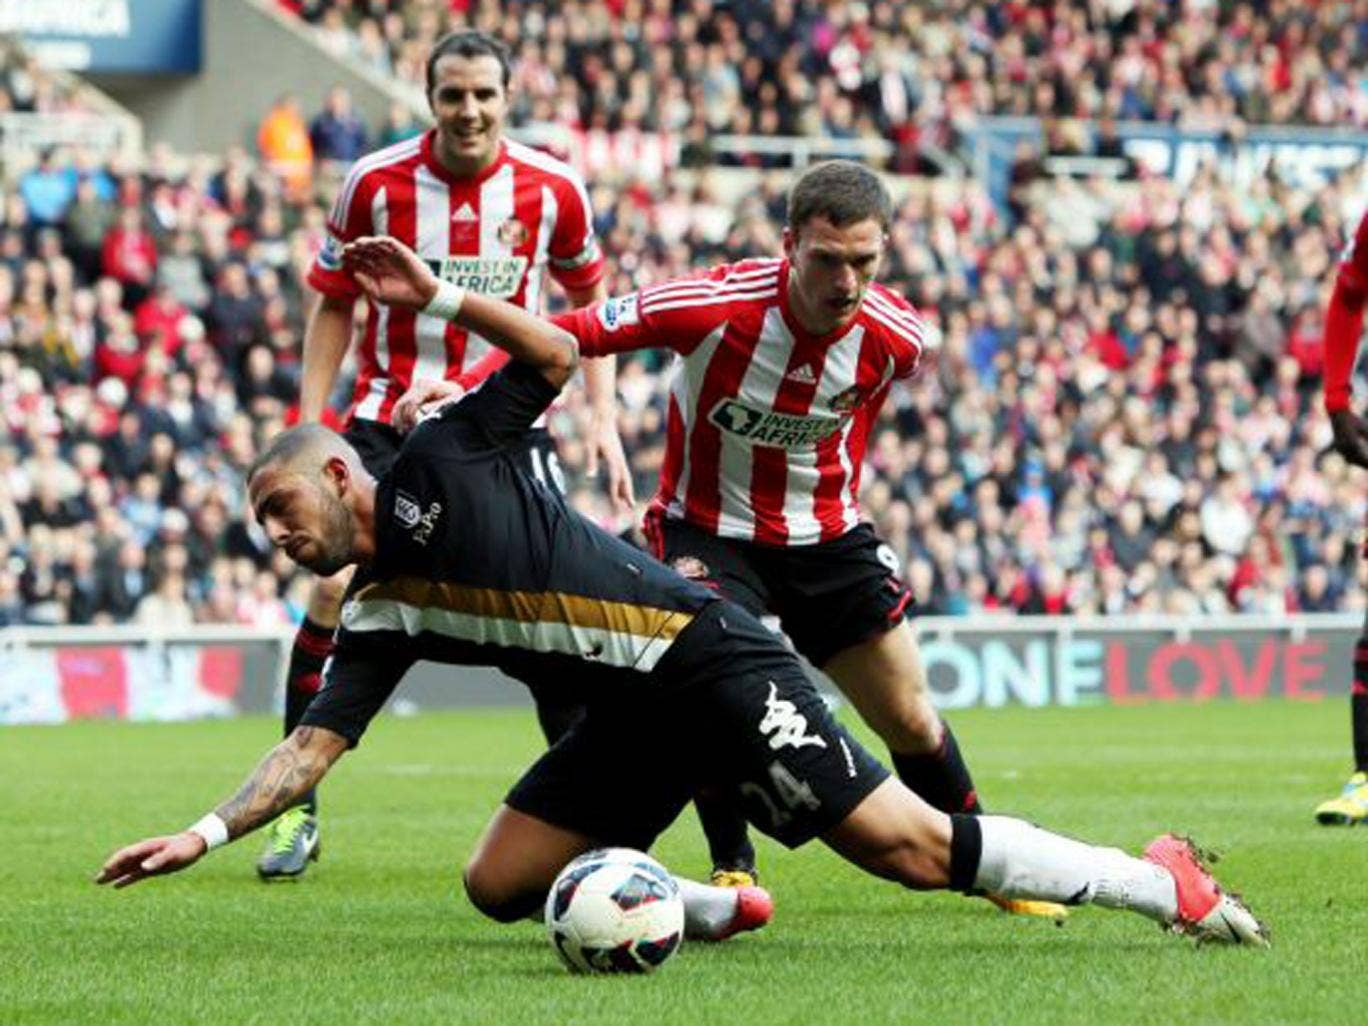 Sunderland's Craig Gardner fouls Fulham's Ashkan Dejagah to concede a penalty during Saturday's Premier League game